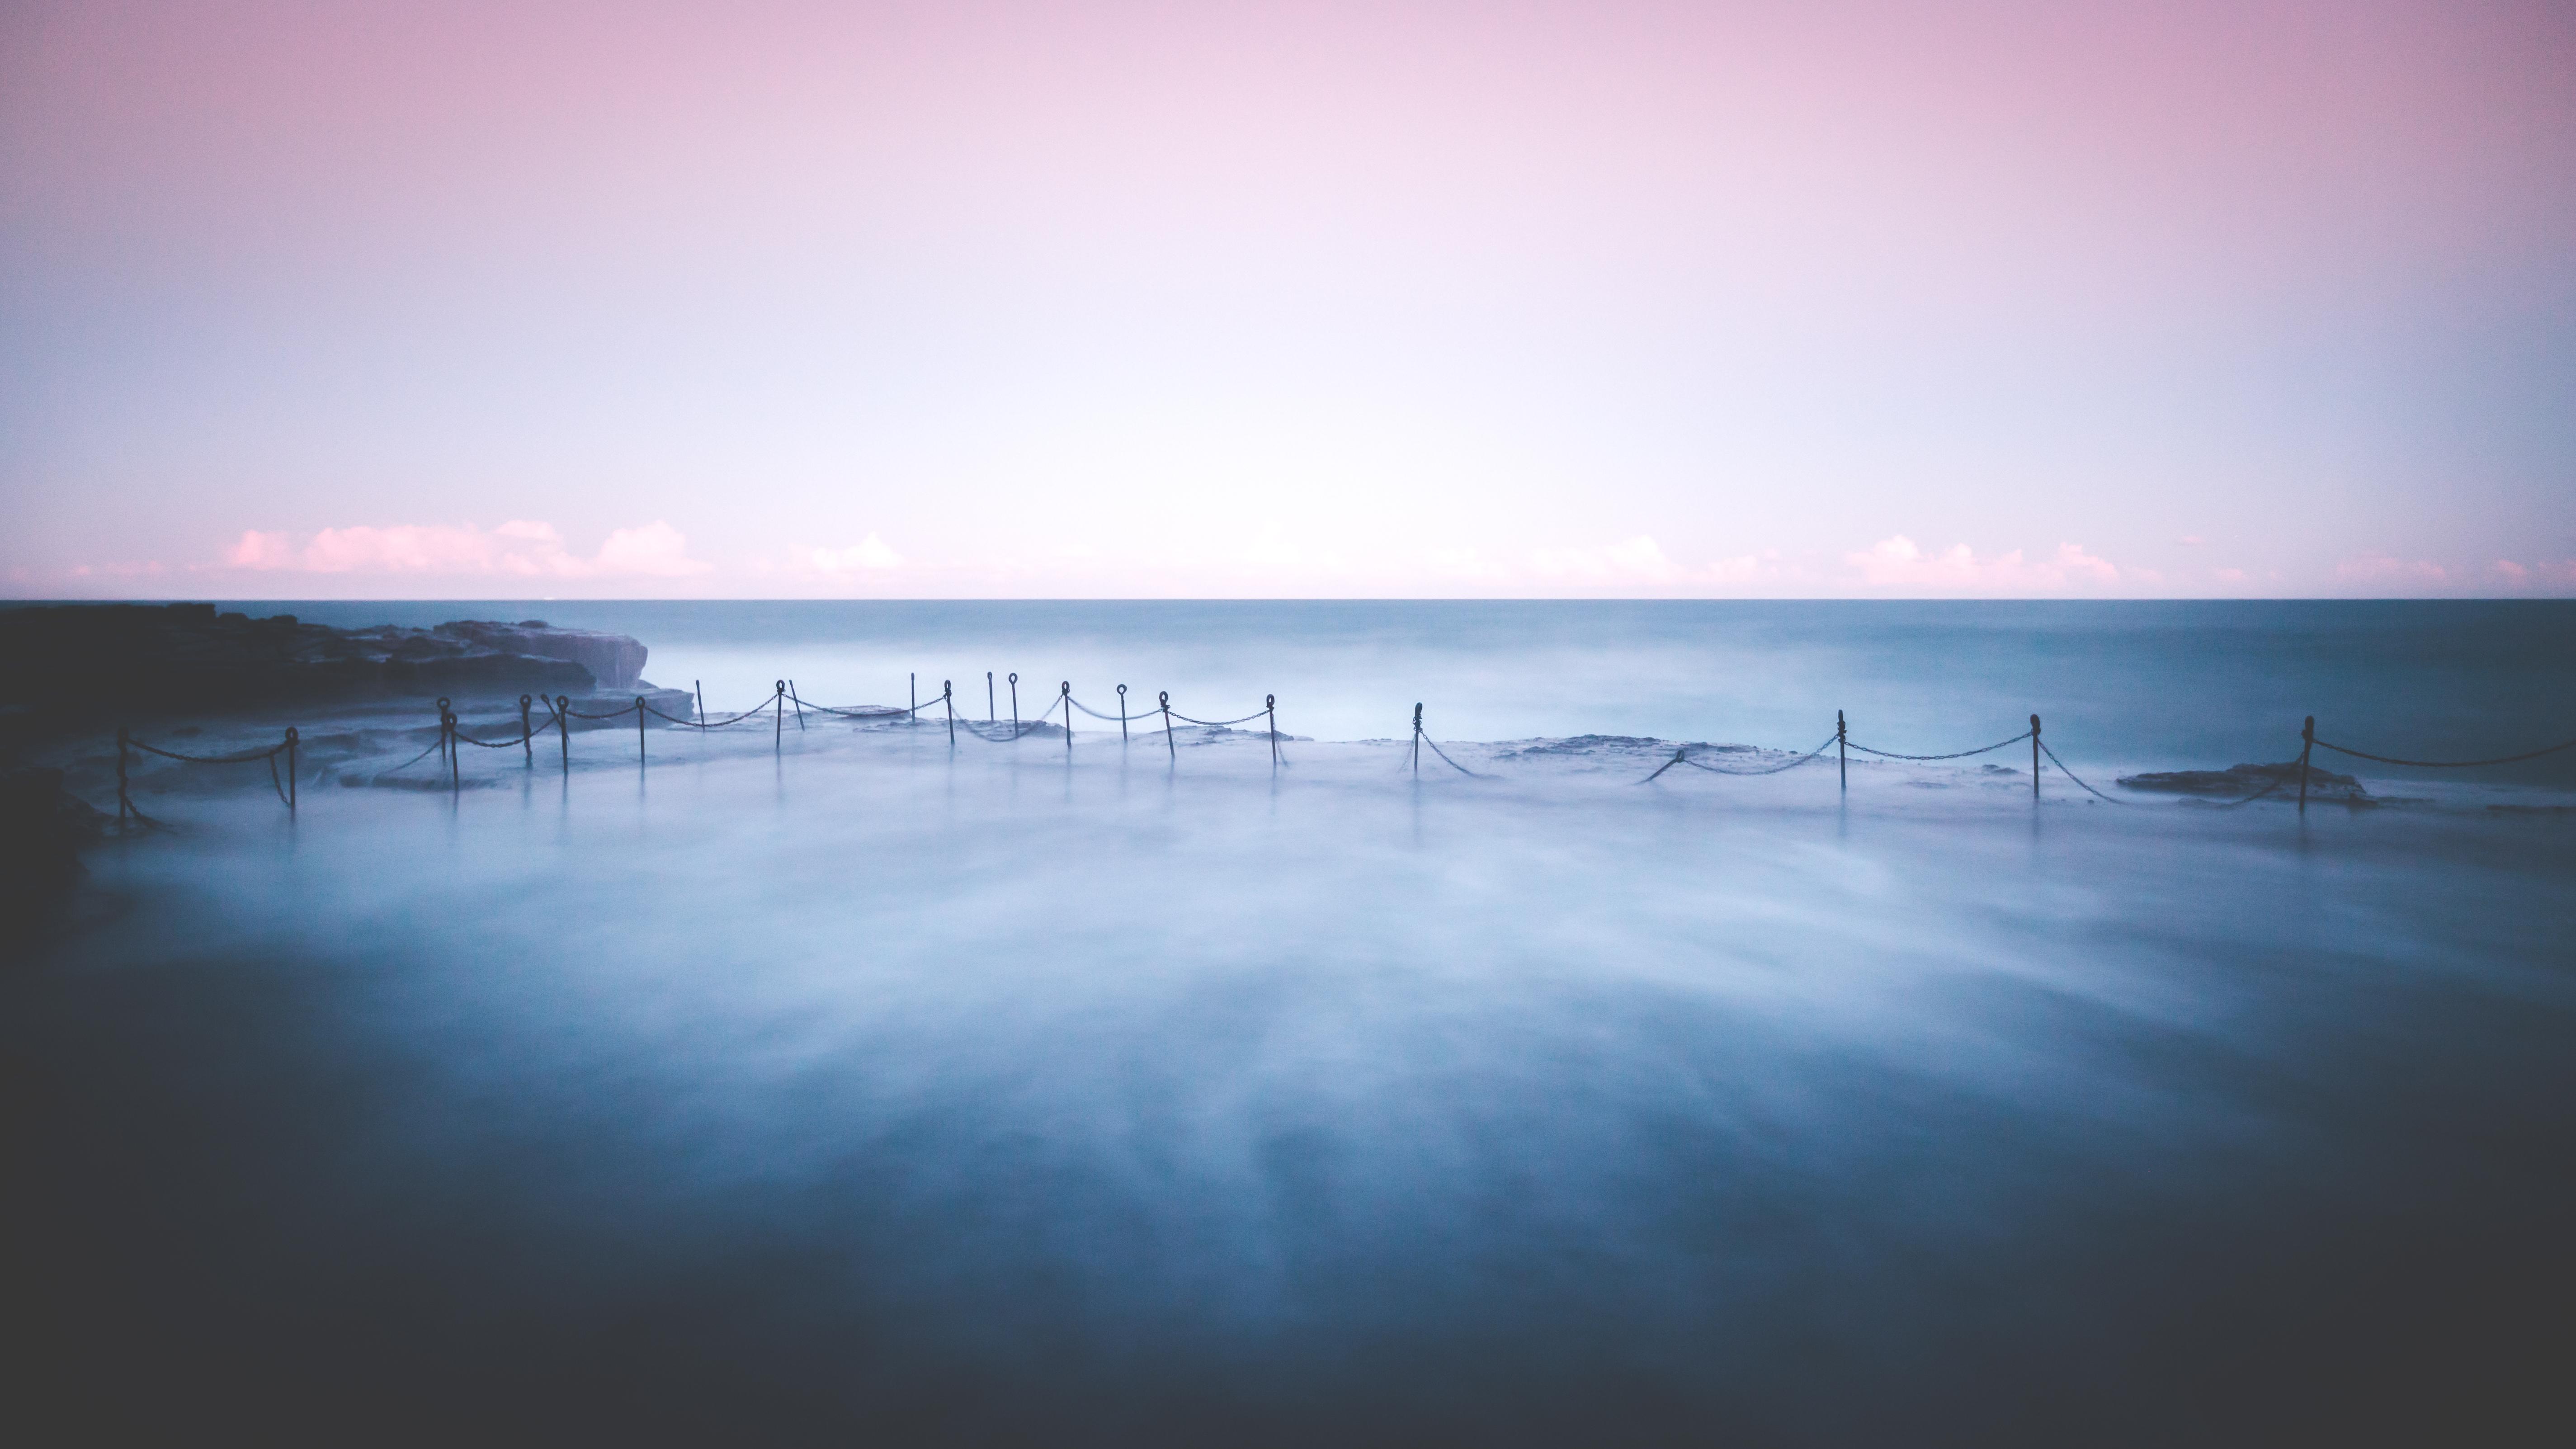 GezXavierMansfieldPhotography2015+28July2015+Landscape-16.jpg